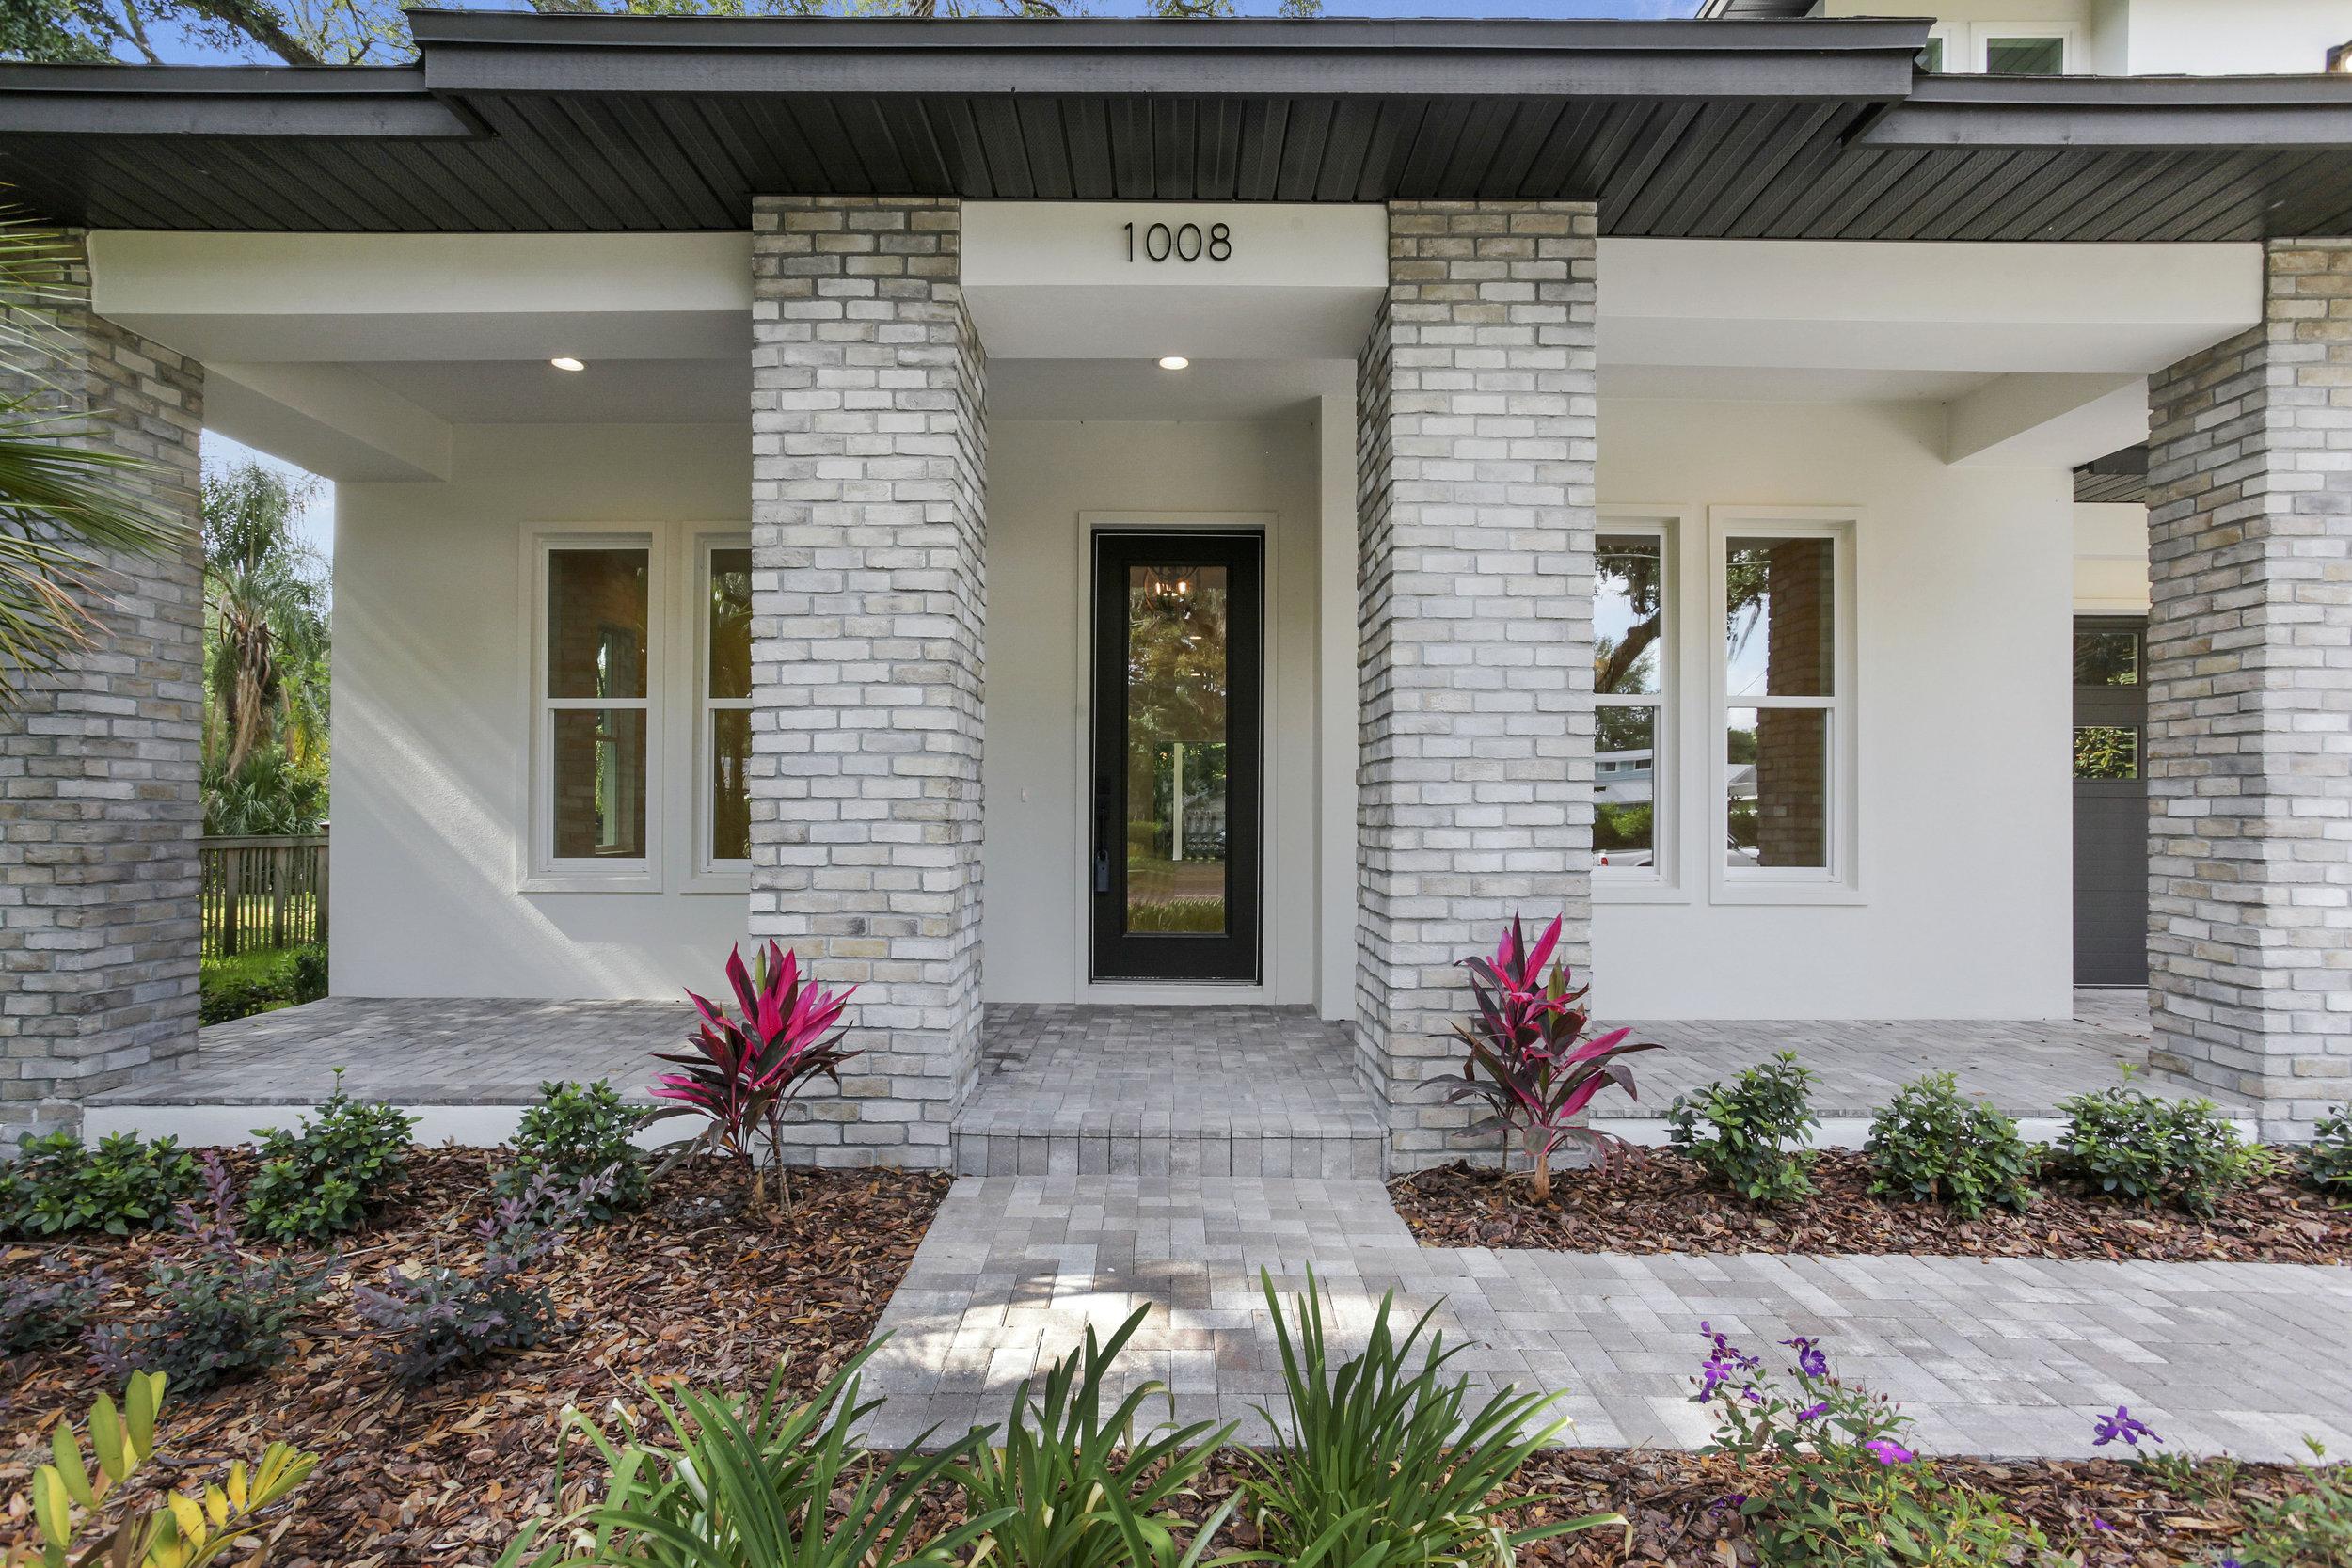 1008 Greenwood St, Orlando_IMG_4896.jpg